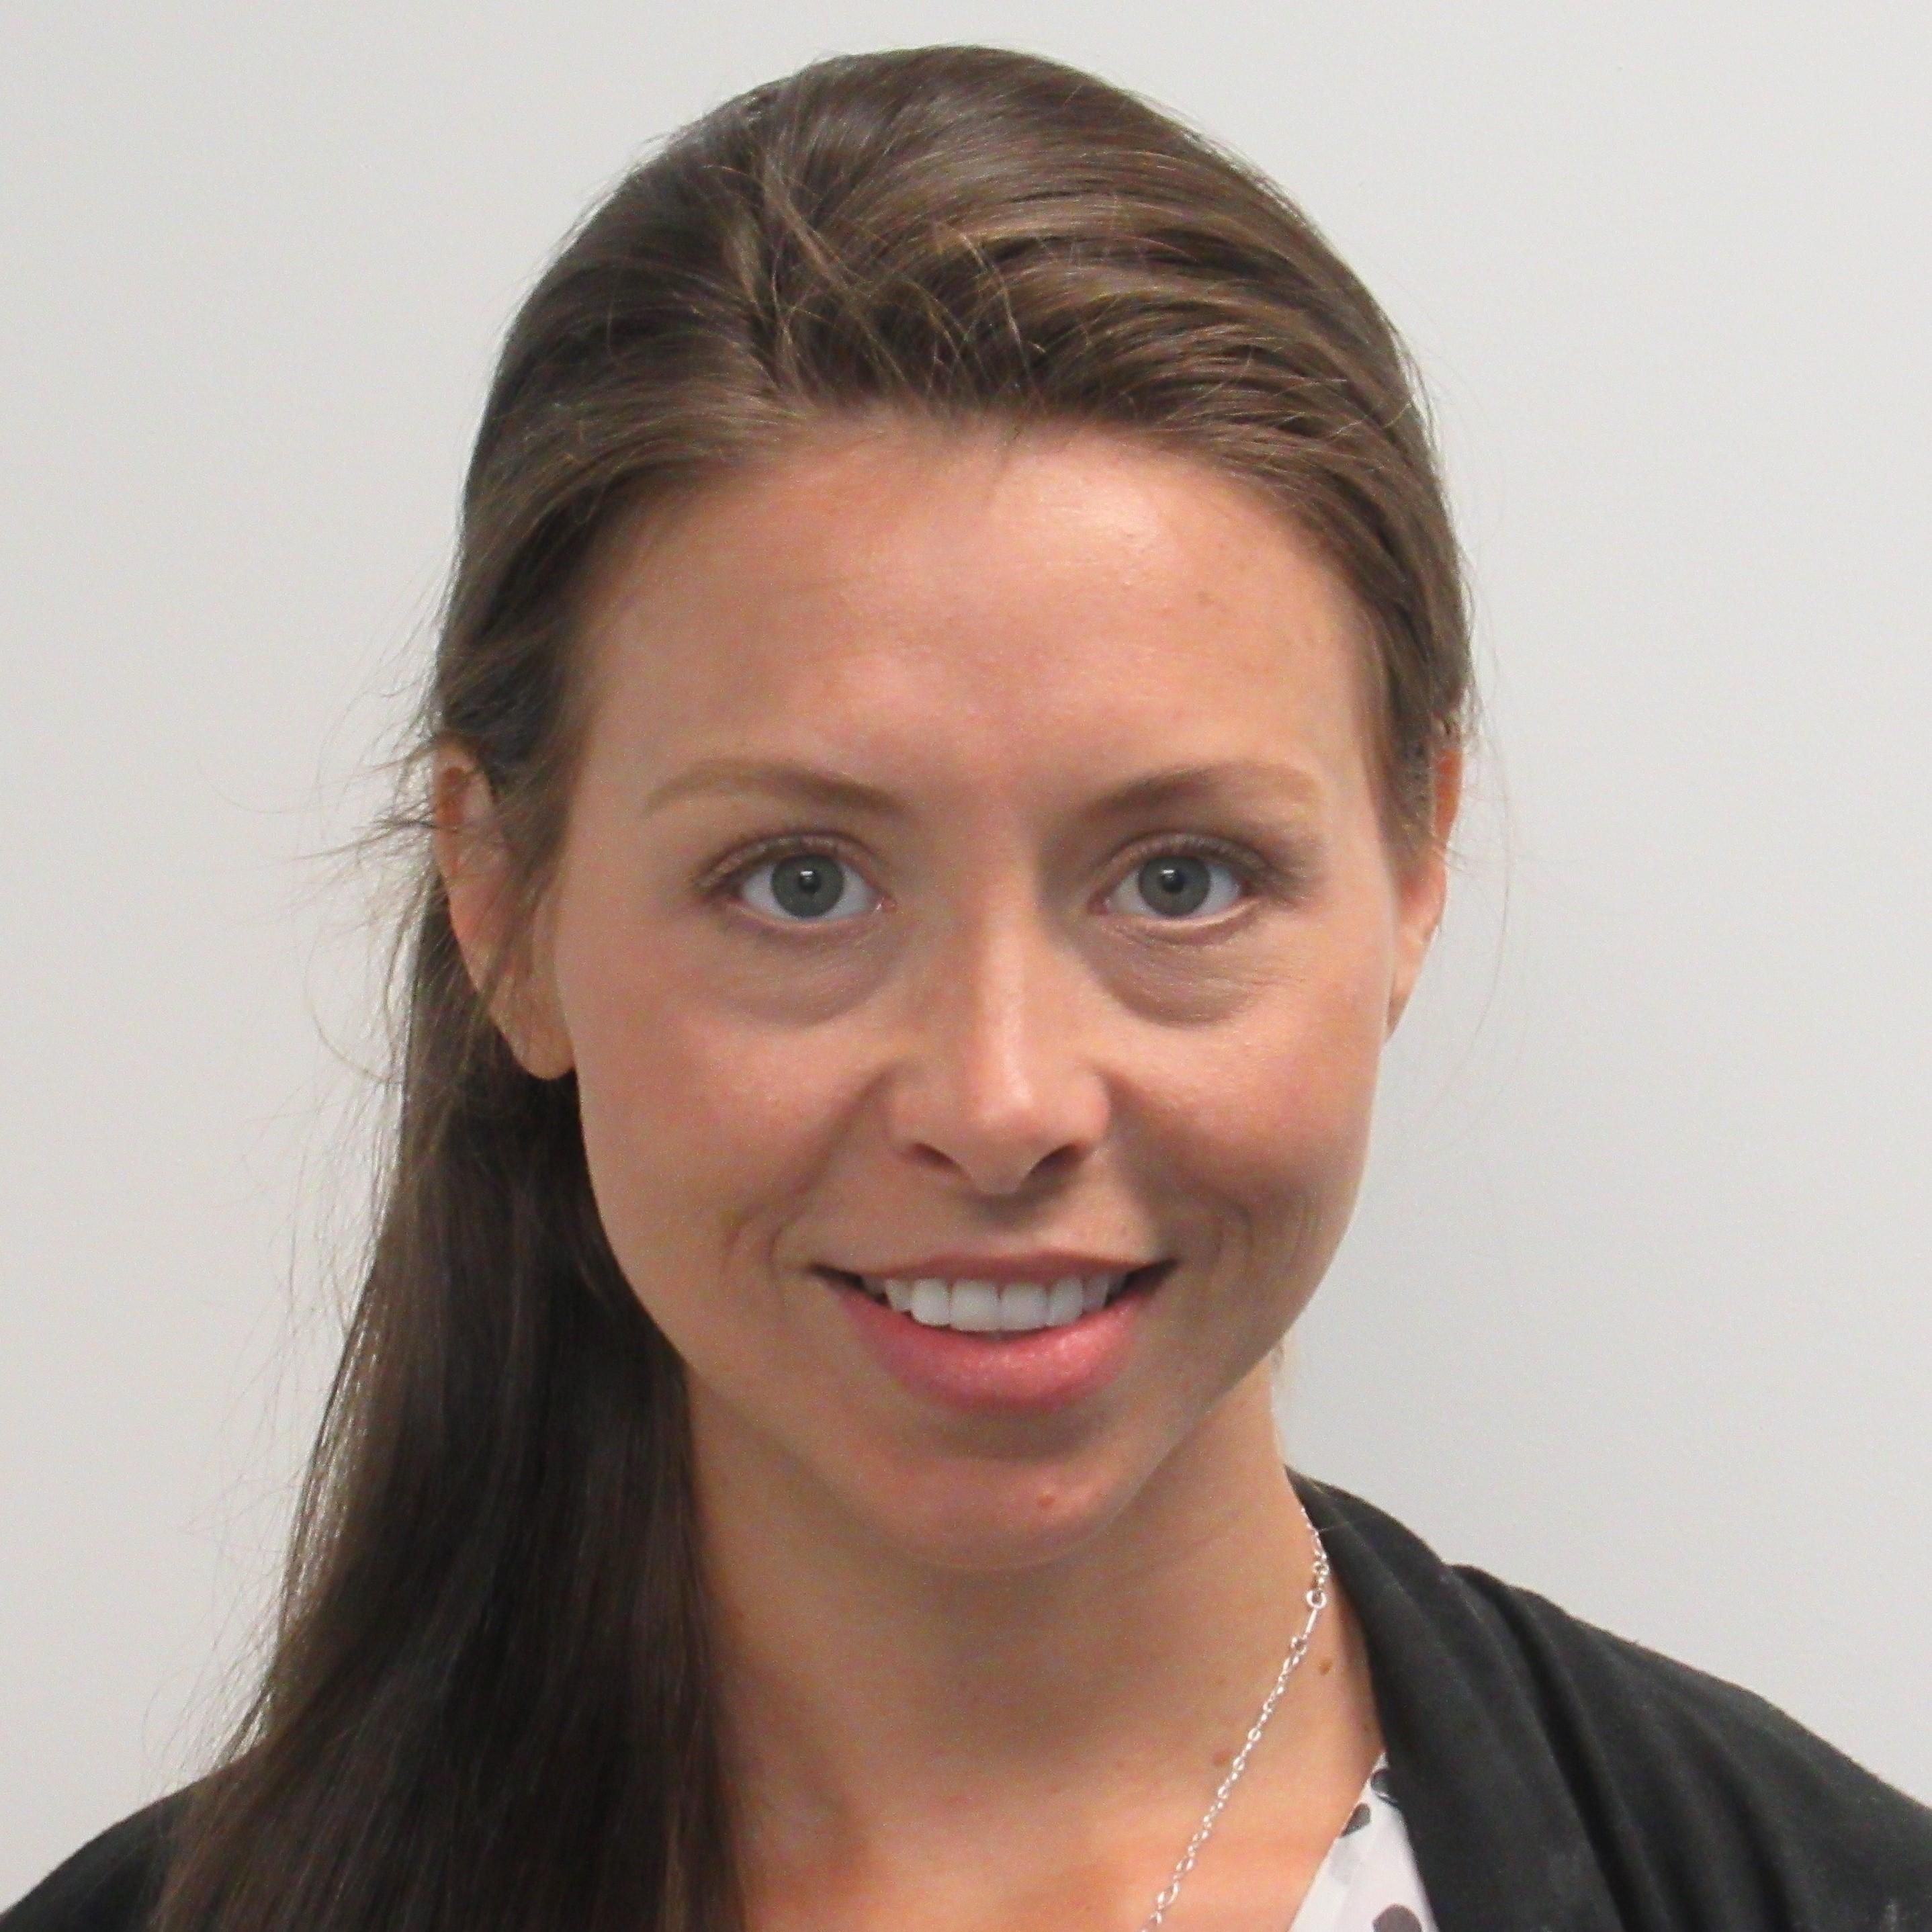 Heather McNeil